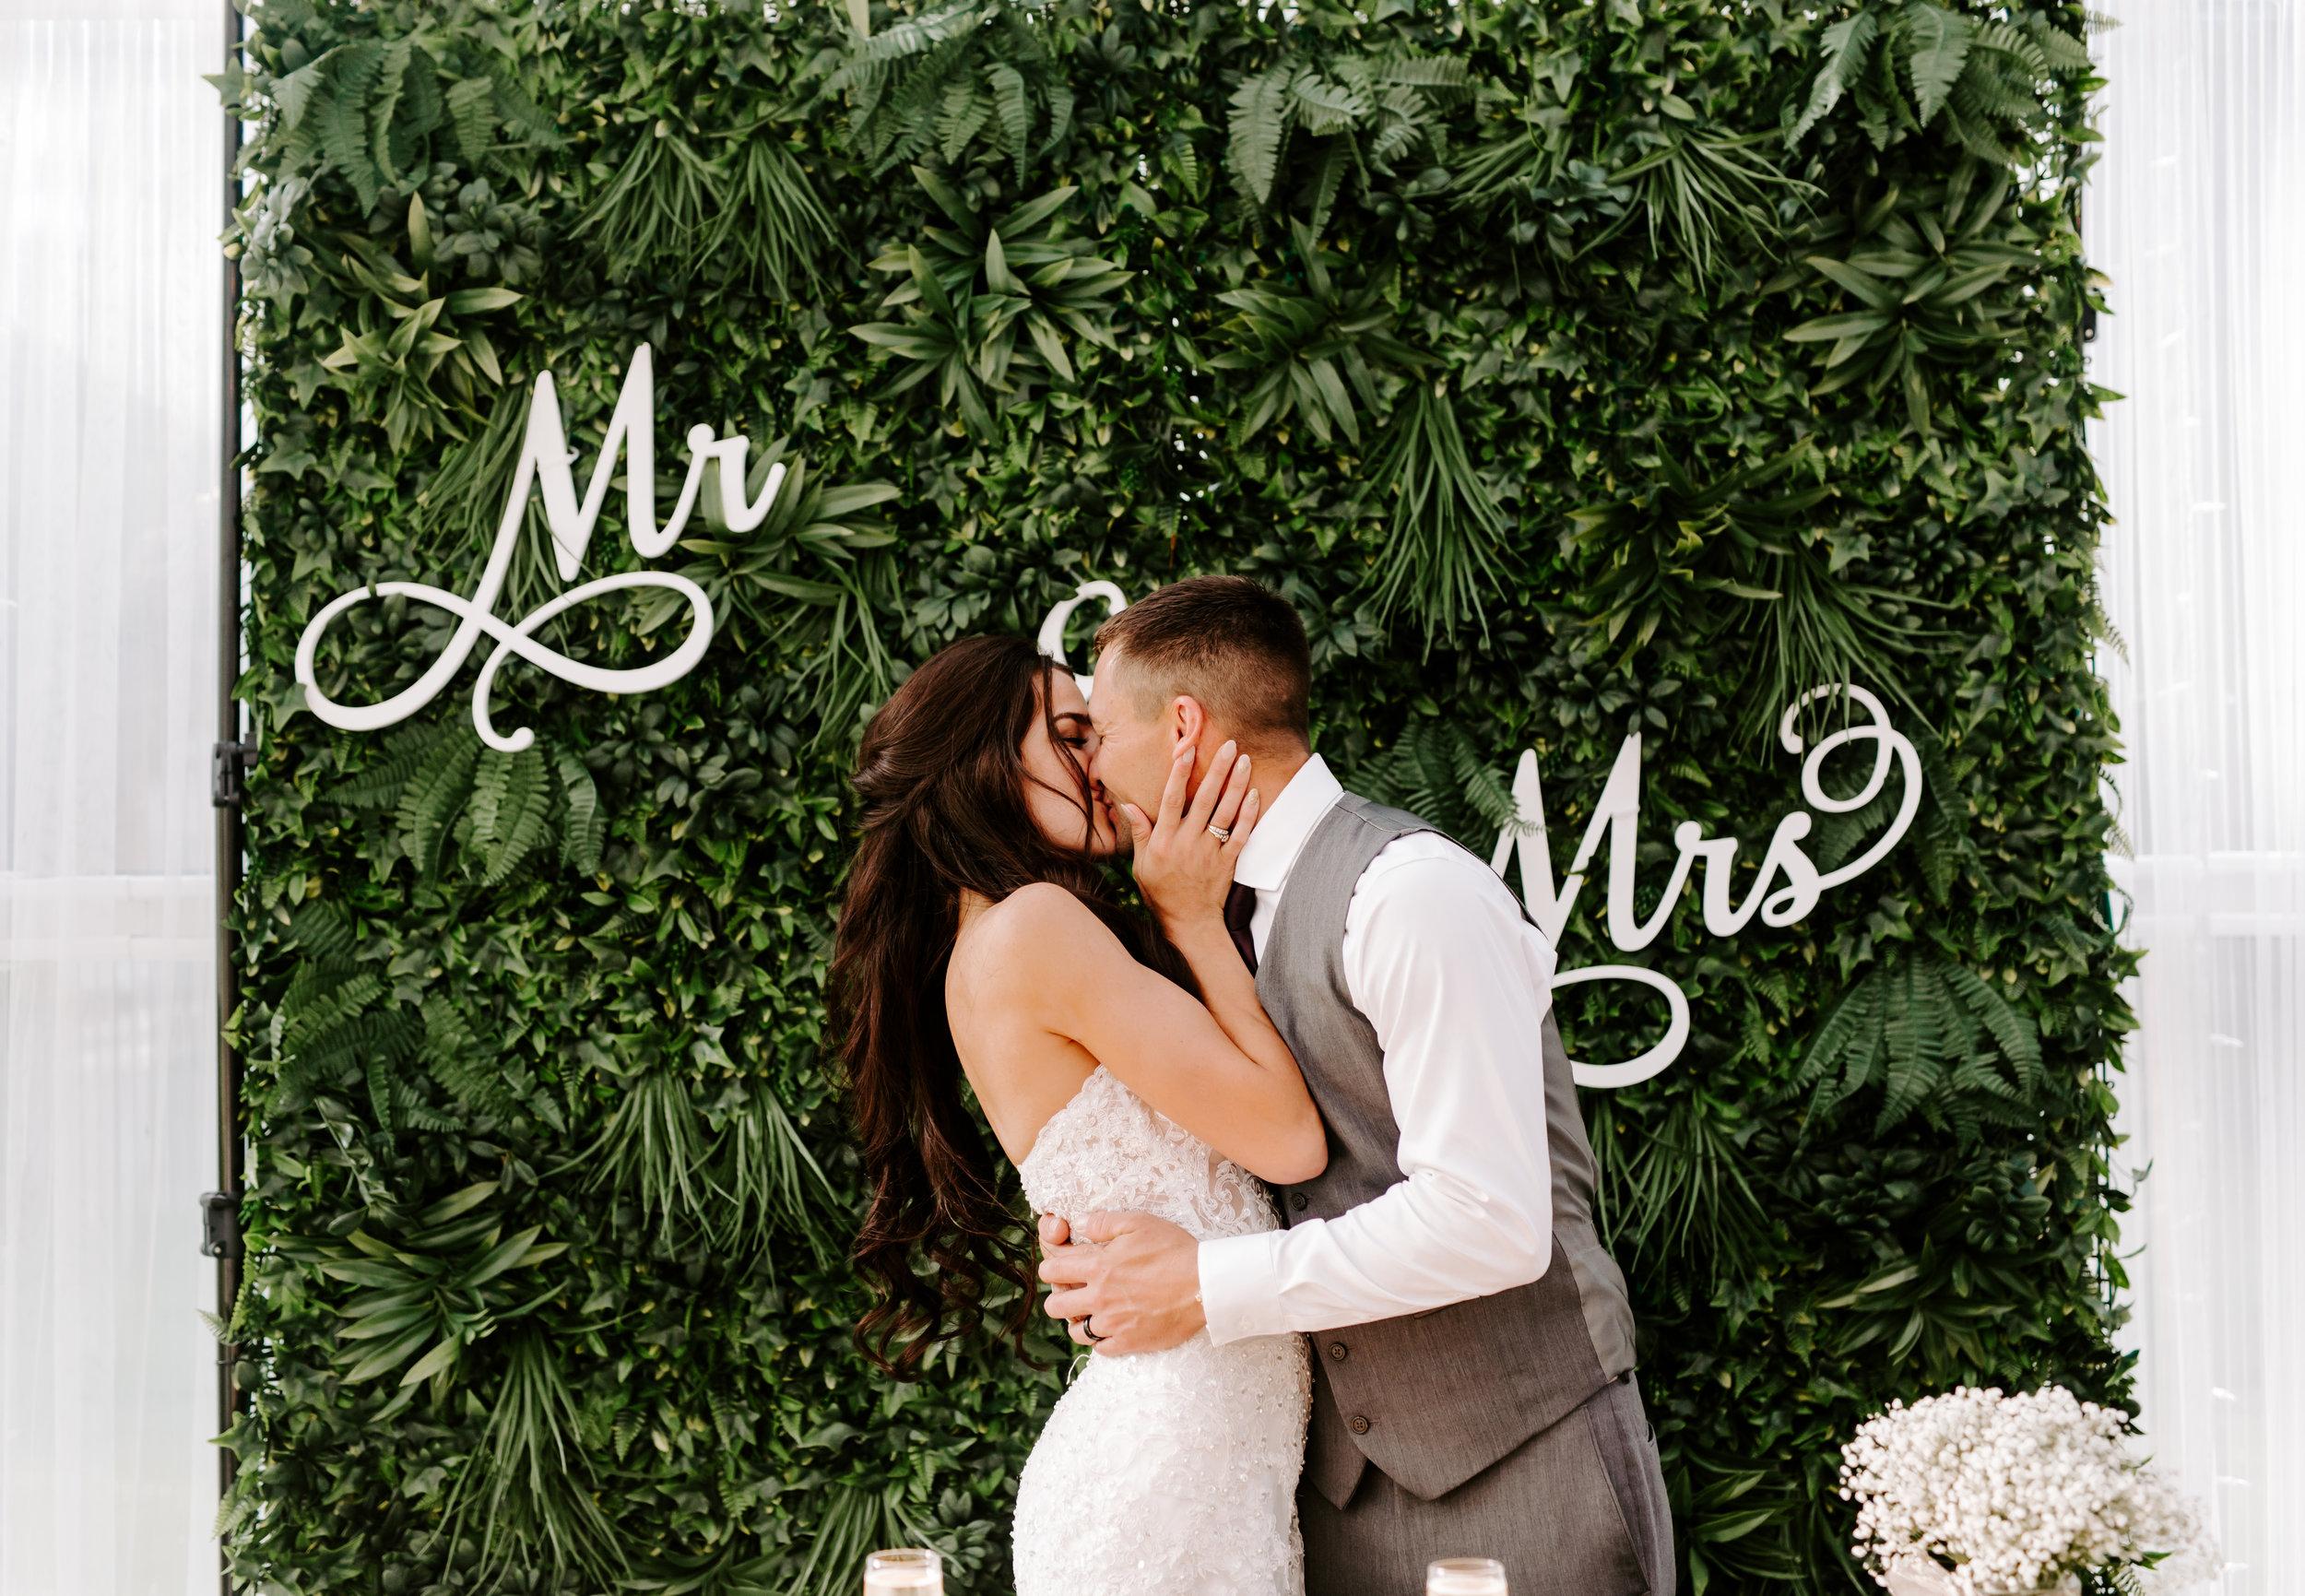 Jackie + Lance - The Heim Wedding - Black Diamond Gardens - Black Diamond Washington - Sneak Peeks! -  Meme Urbane Photography-25.jpg